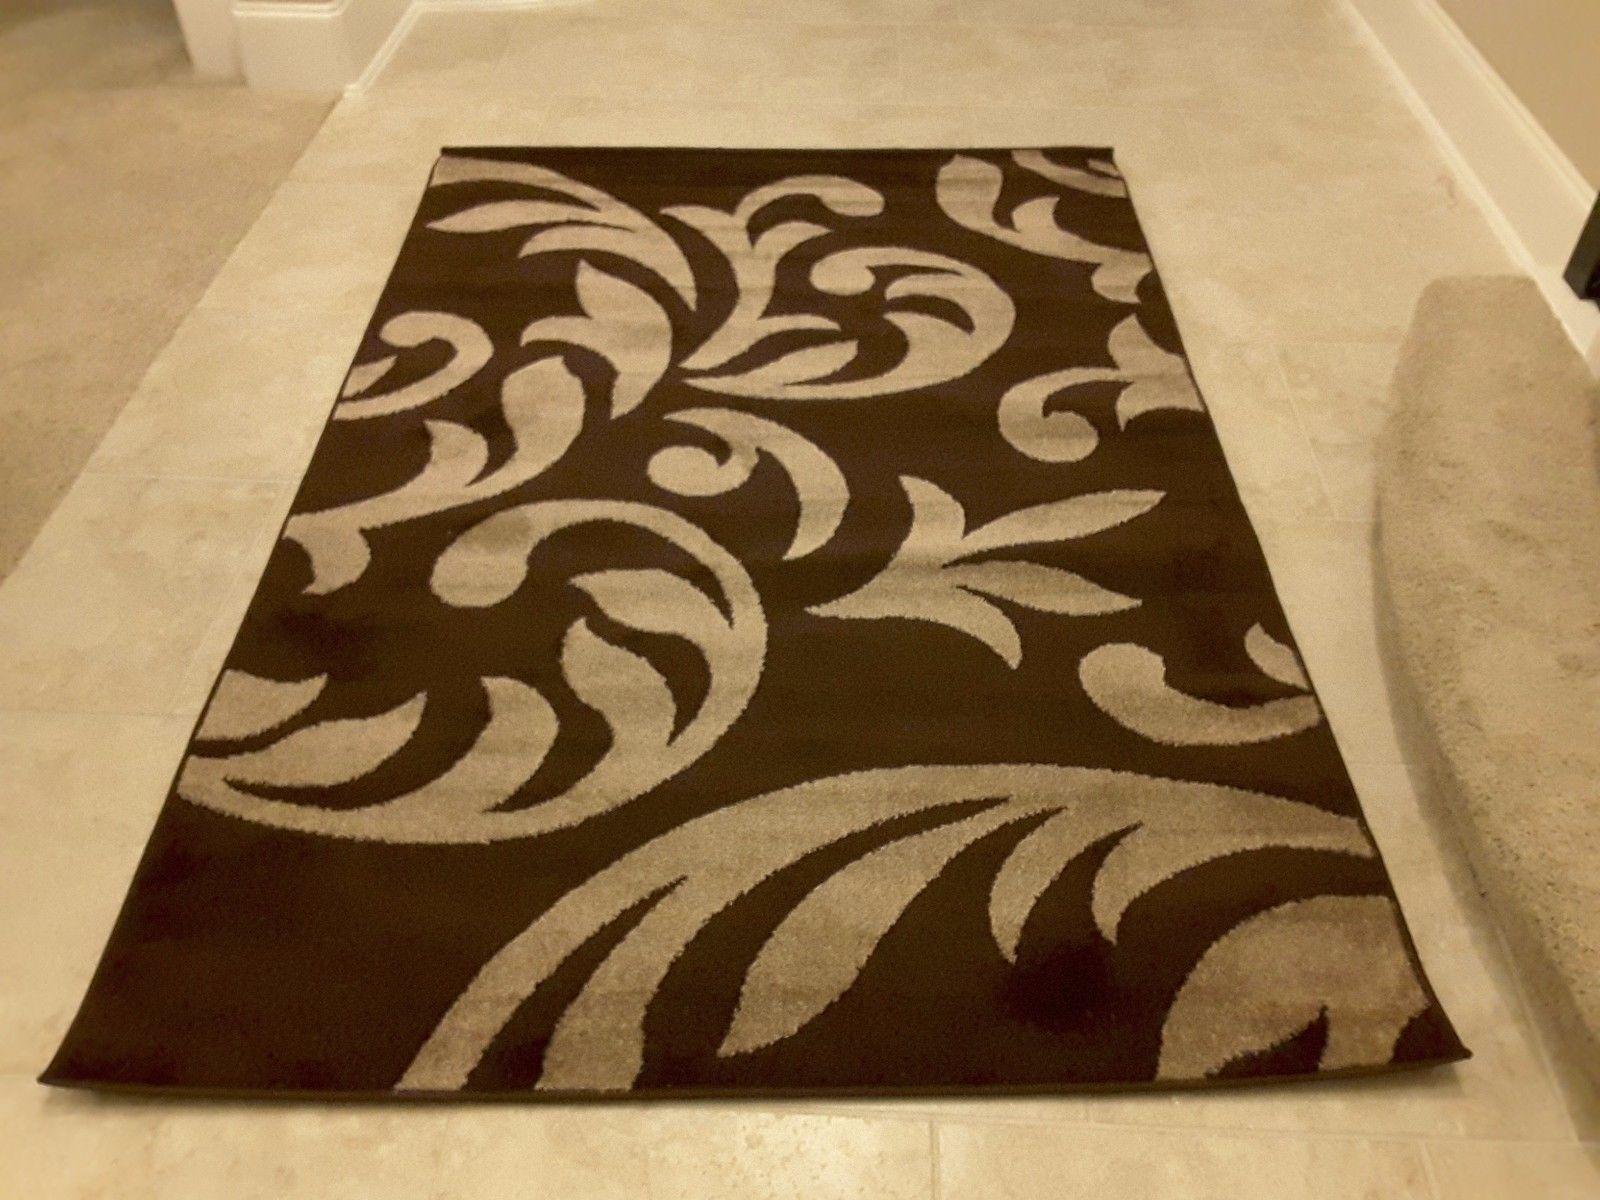 7001 beautiful contemporary modern area rug carpet 5x7 for Area rugs contemporary modern